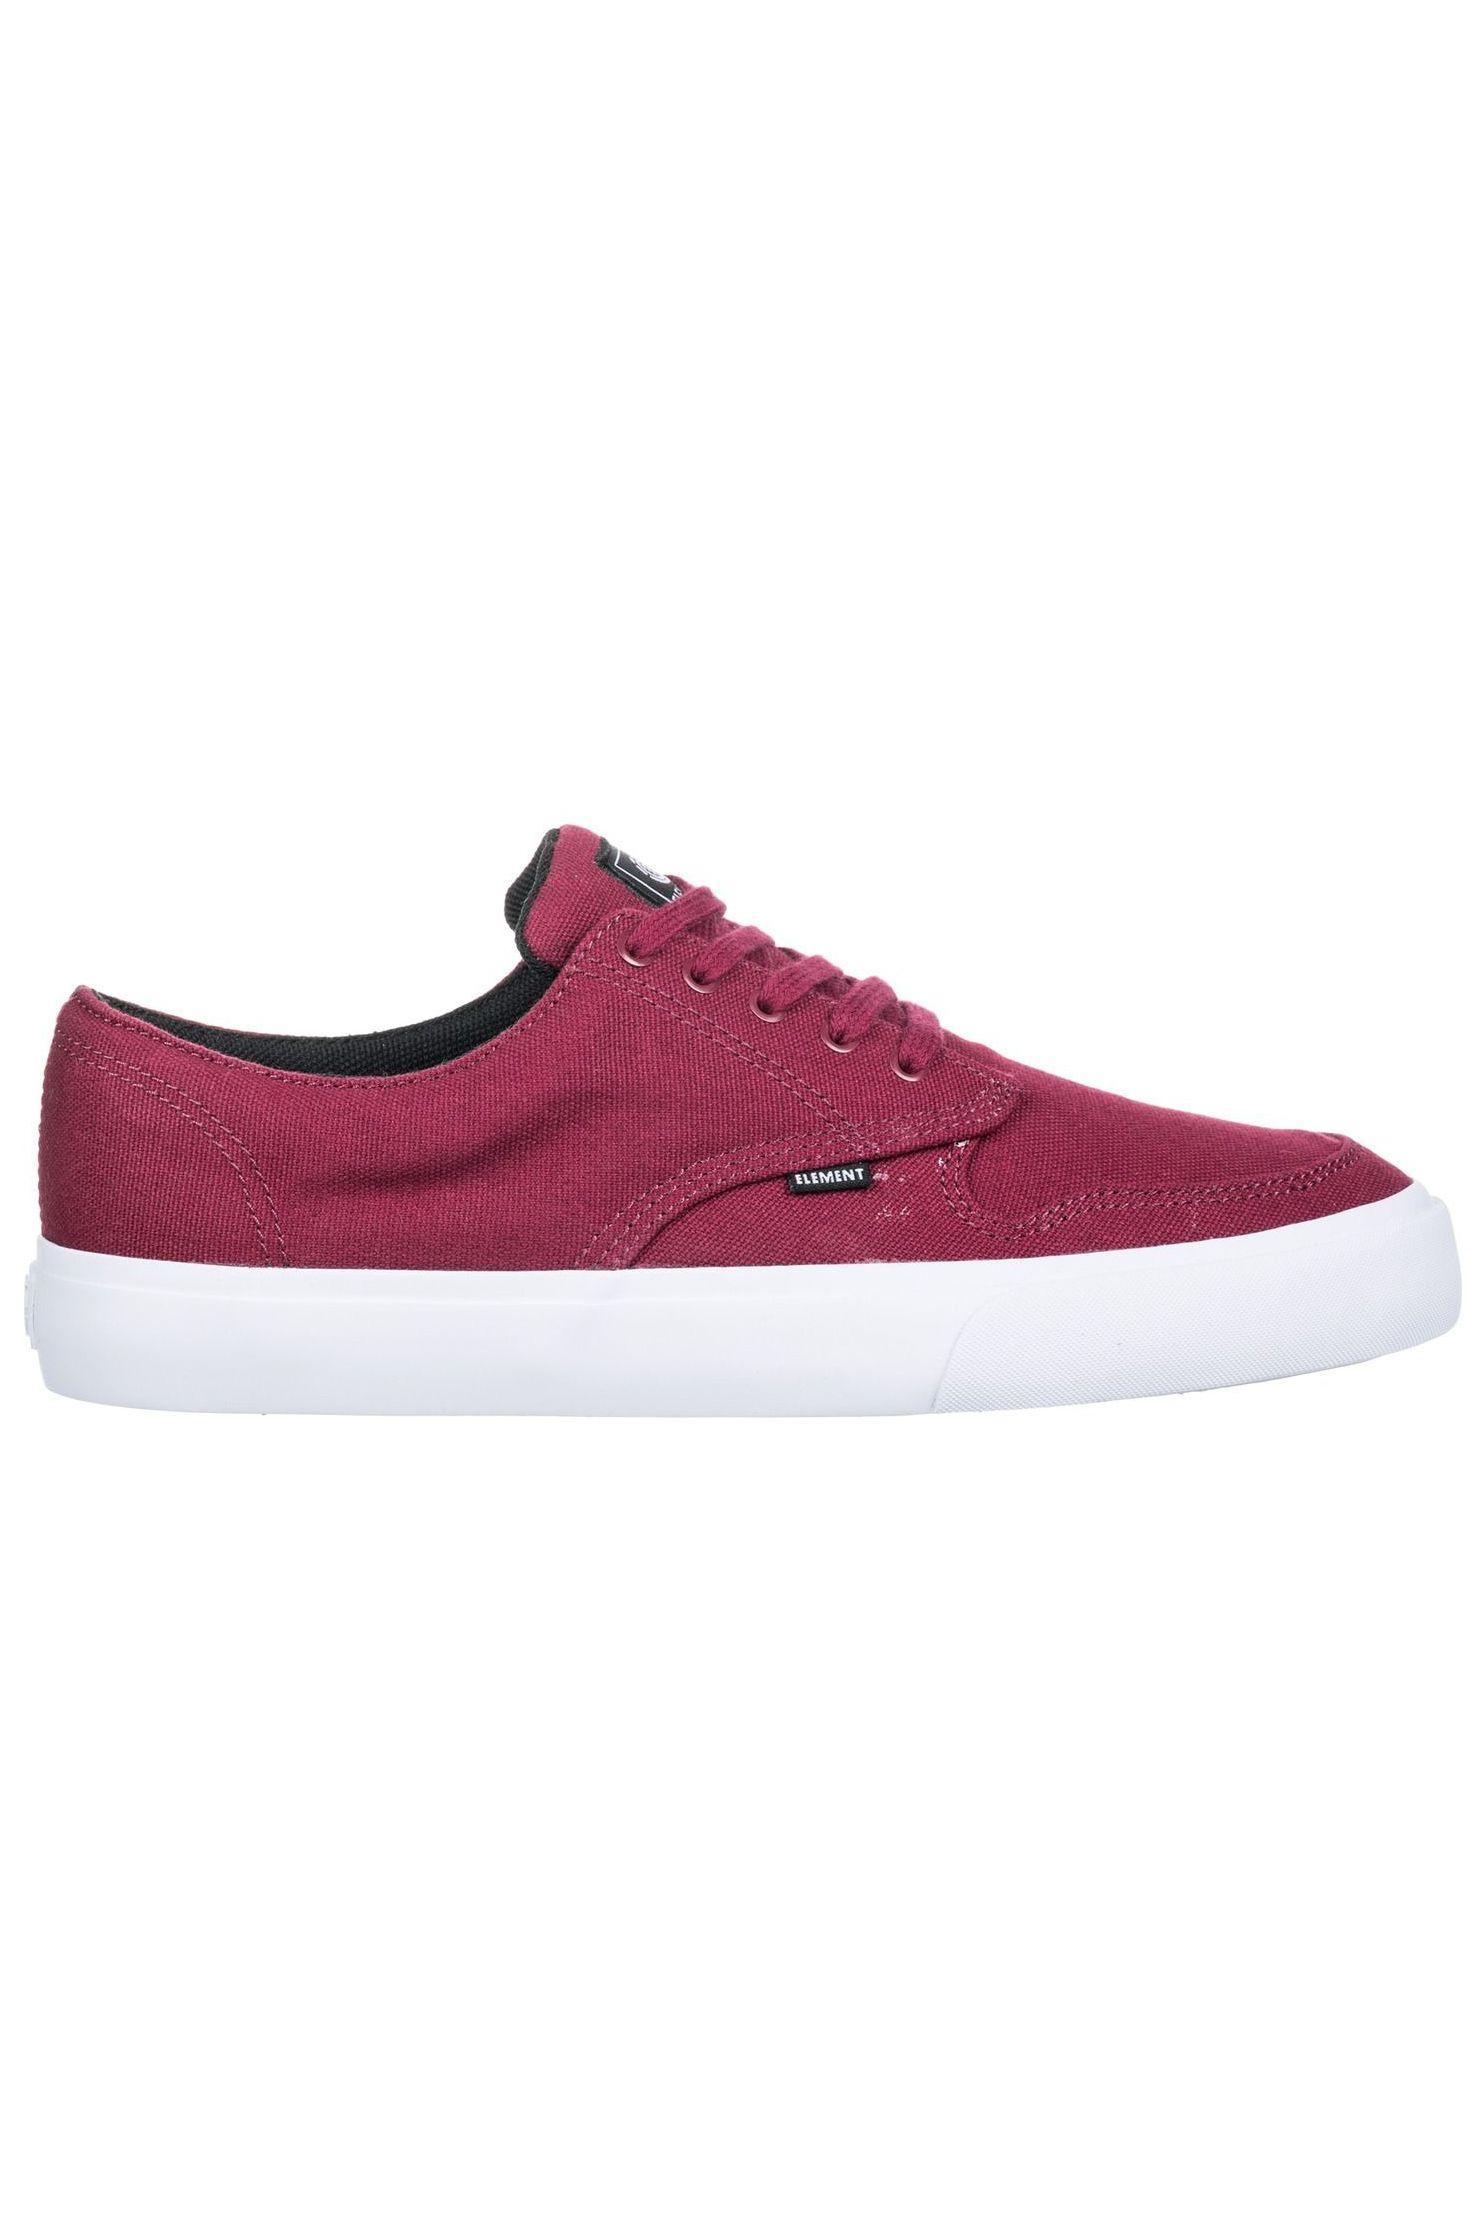 Element Shoes TOPAZ C3 Vintage Red